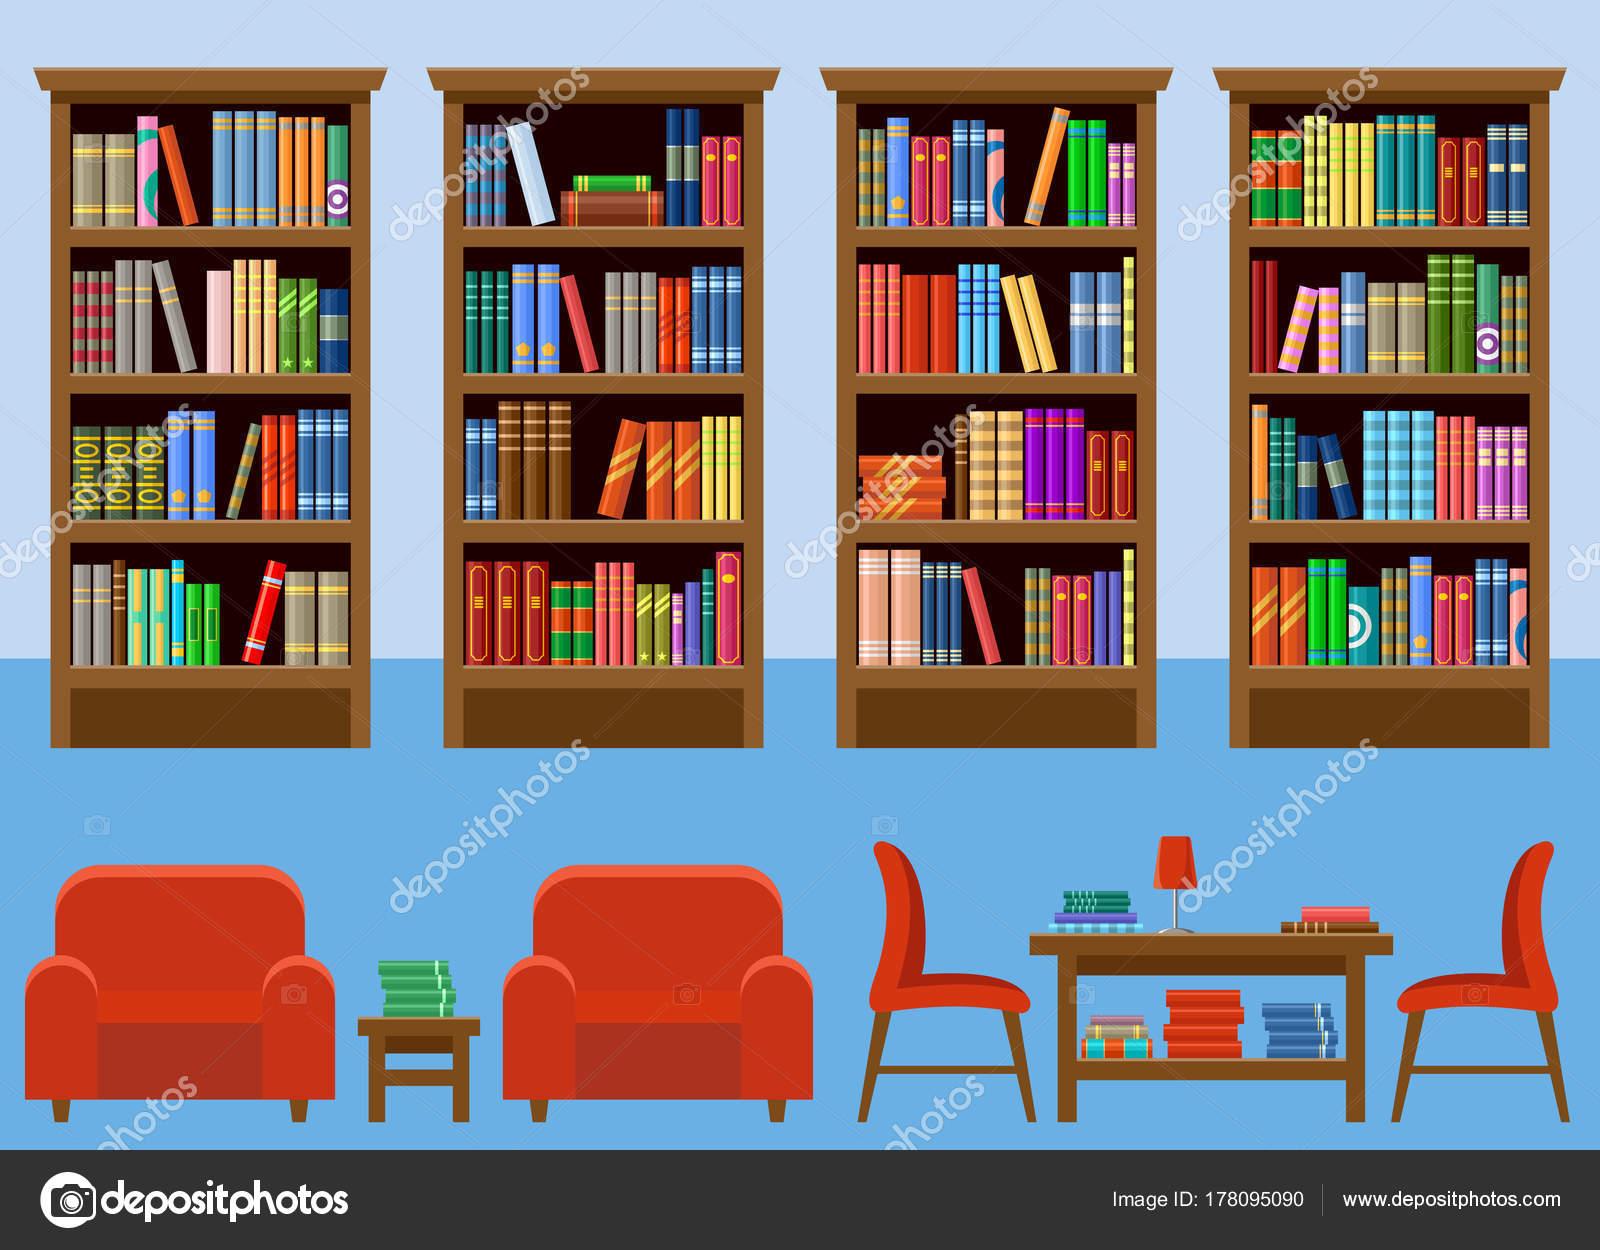 Interior Books u2014 Stock Vector Library room